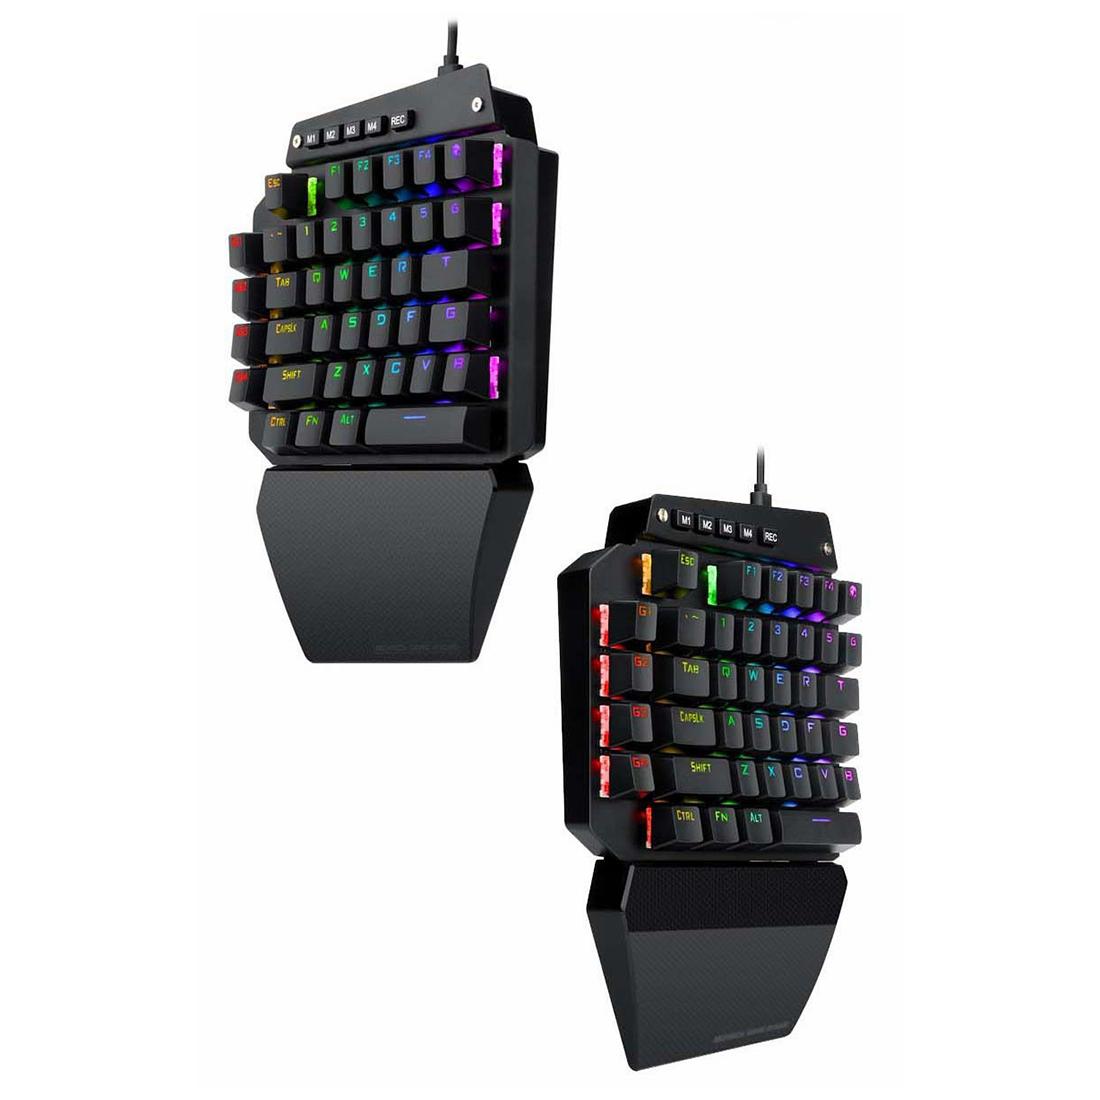 K700 One-hand 44-Key Gaming Mechanical Keyboard RGB LED Backlight